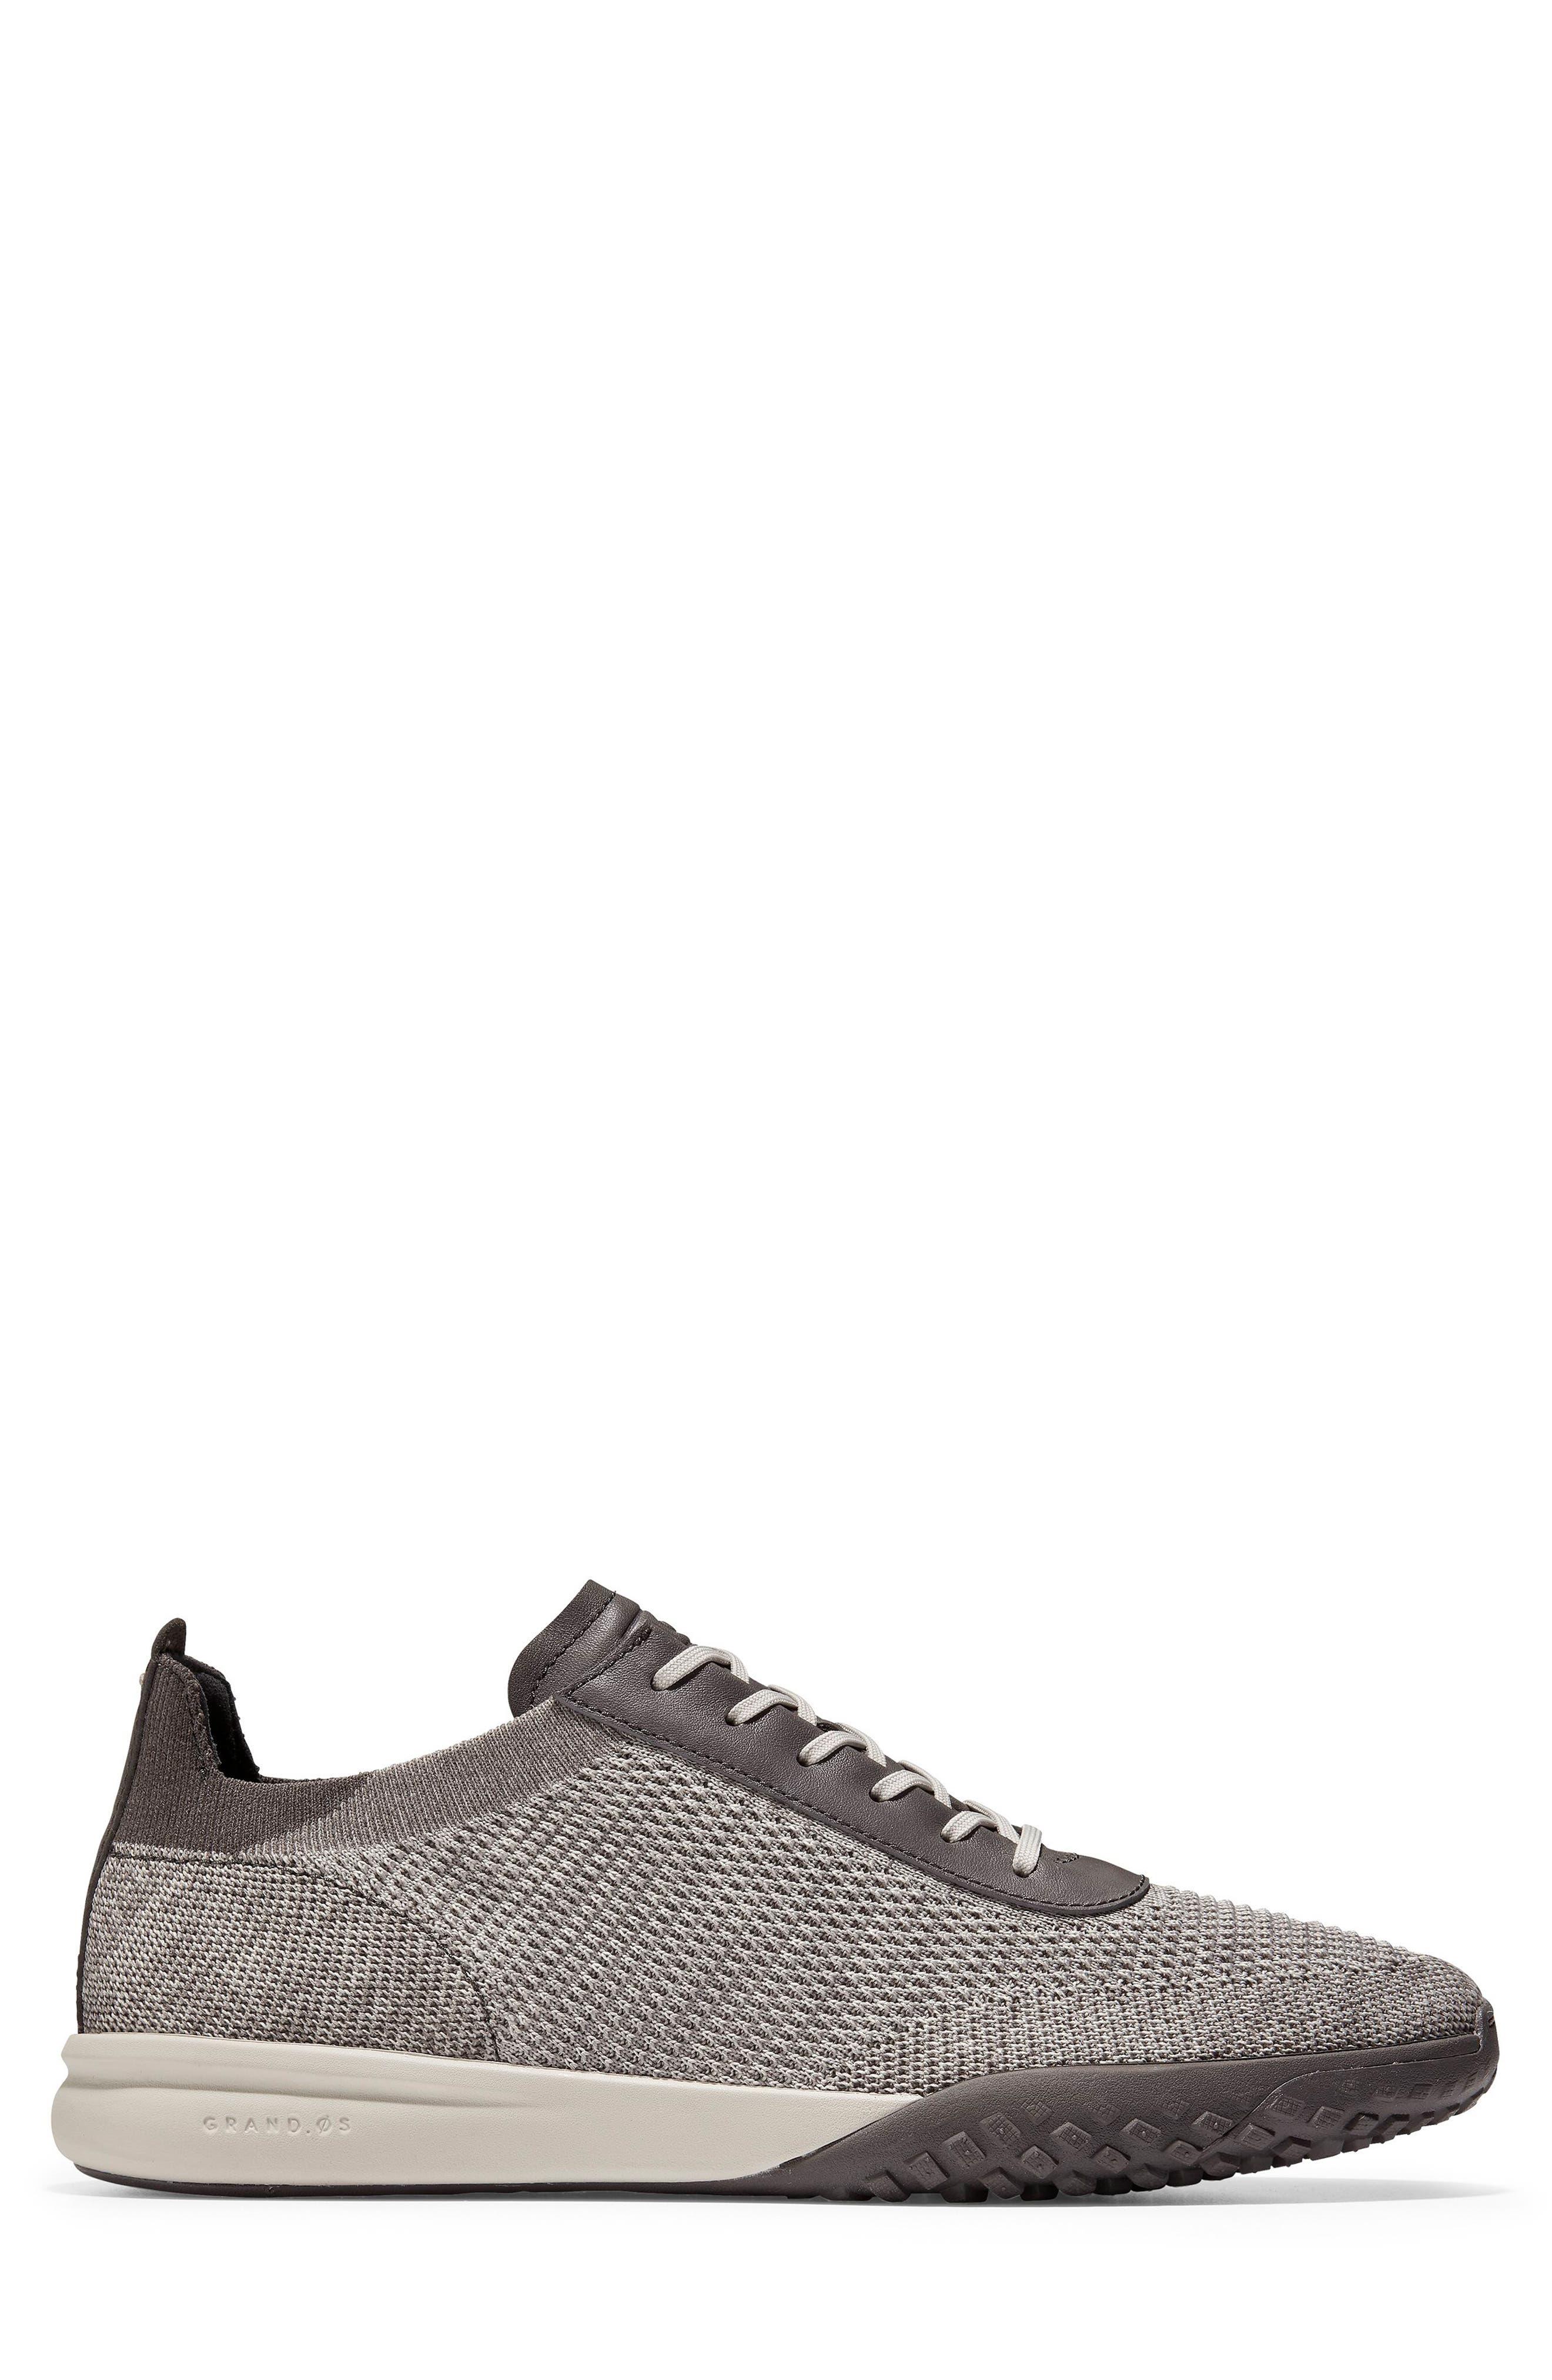 GrandPro Trail Low Stitchlite Sneaker,                             Alternate thumbnail 3, color,                             BLACK/ VAPOR GREY KNIT